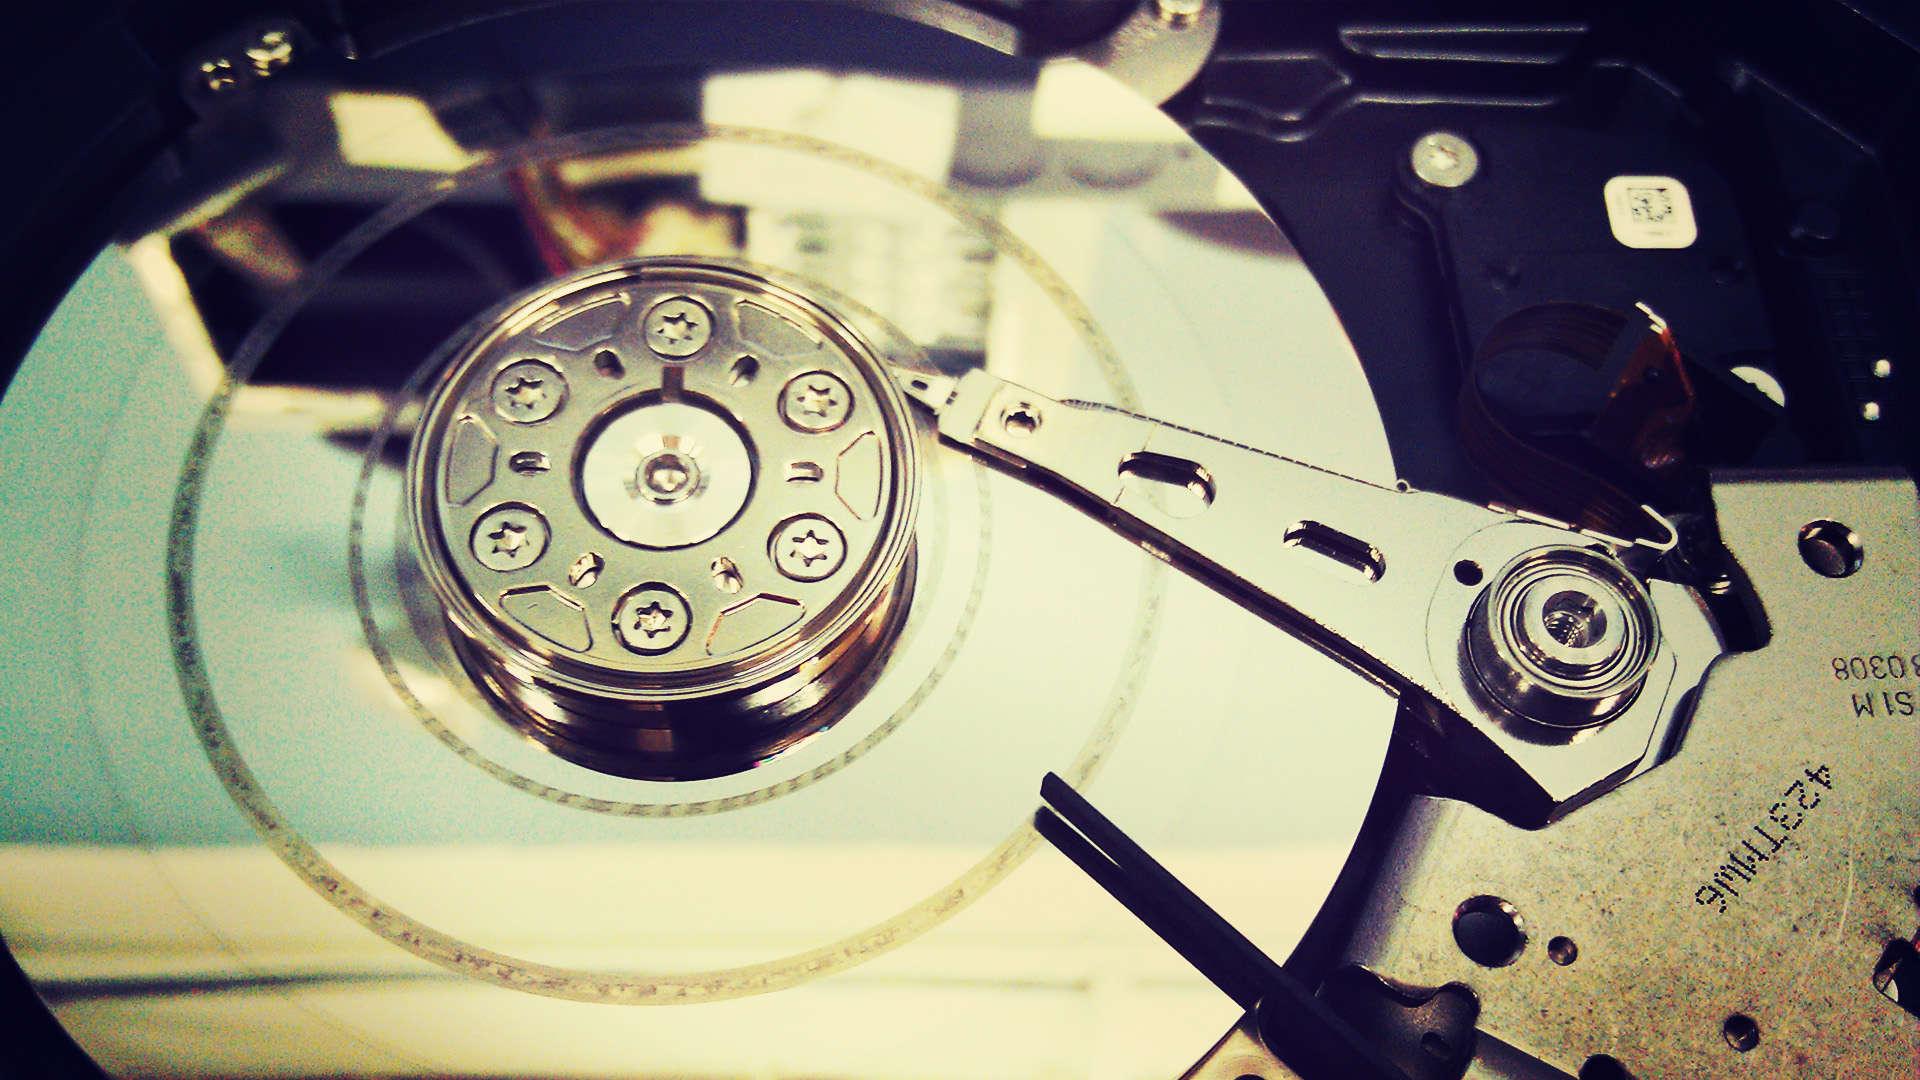 Download Hard Drive Data Recovery Services Wallpaper HDWallWidecom 1920x1080